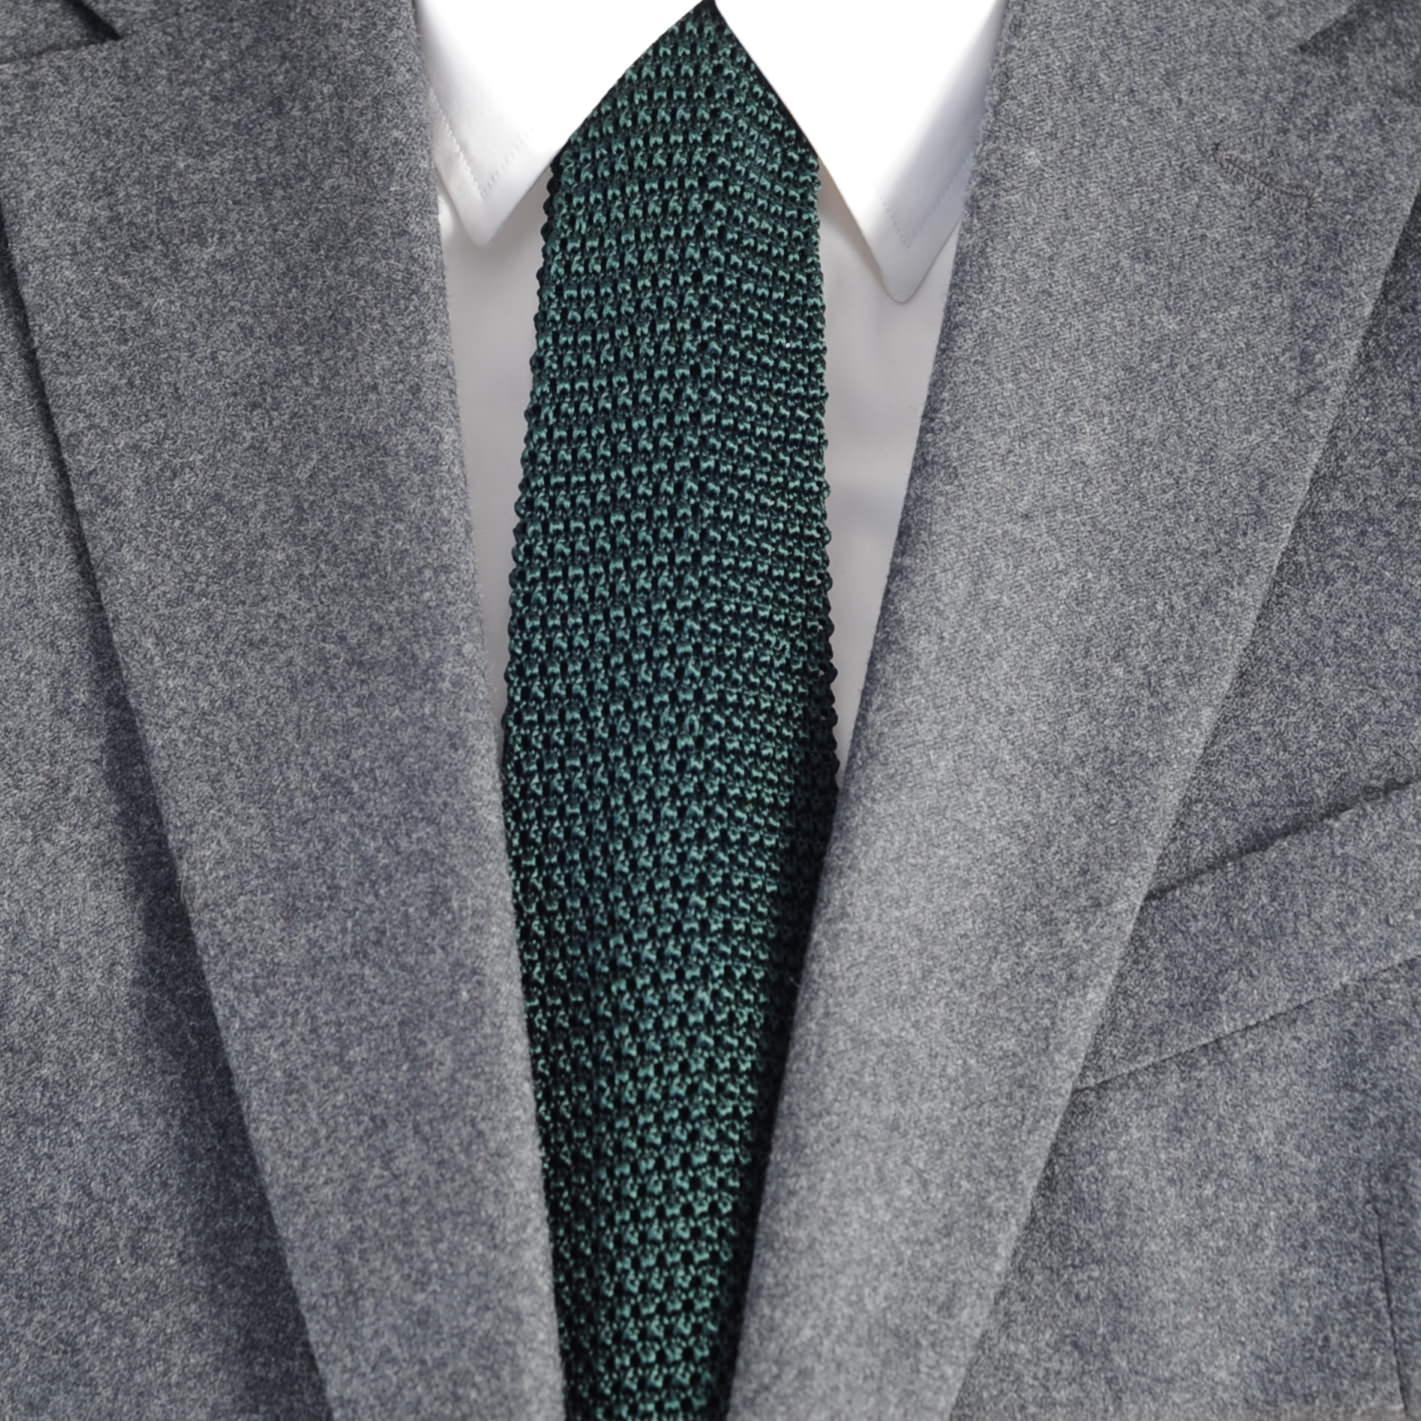 cravate soie tricot vert fonc costume gris verygoodlord blog mode homme et conseils mode. Black Bedroom Furniture Sets. Home Design Ideas